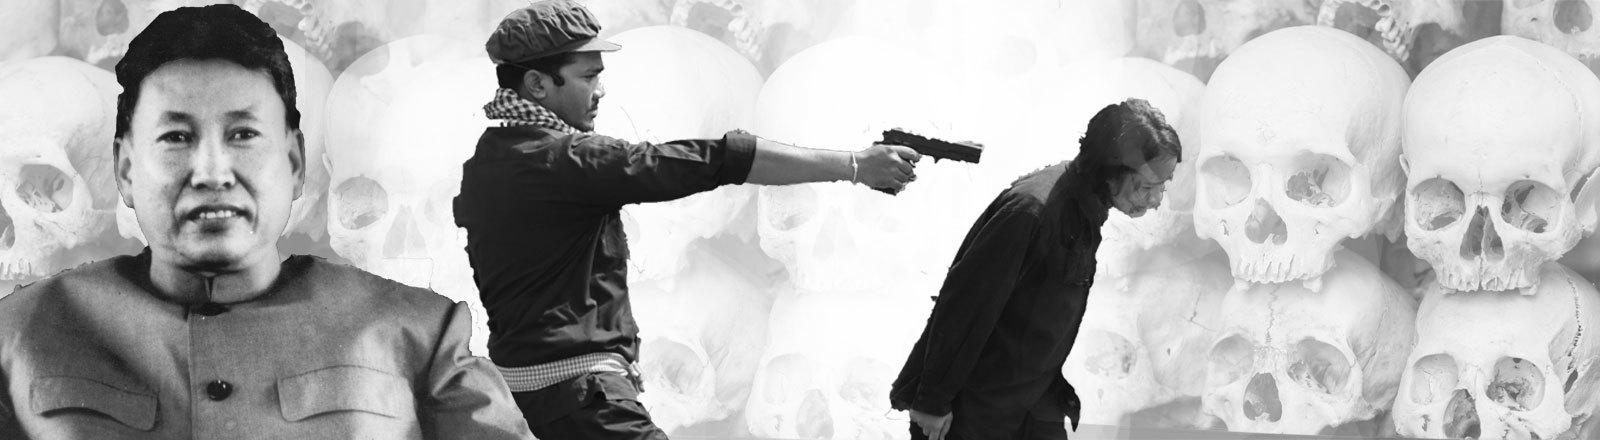 "Totenschädel der Opfer im kambodschanischen Phnom Penh. Filmausschnitt ""The Killing Fields"". Revolutionsführer Pol Pot 1977."